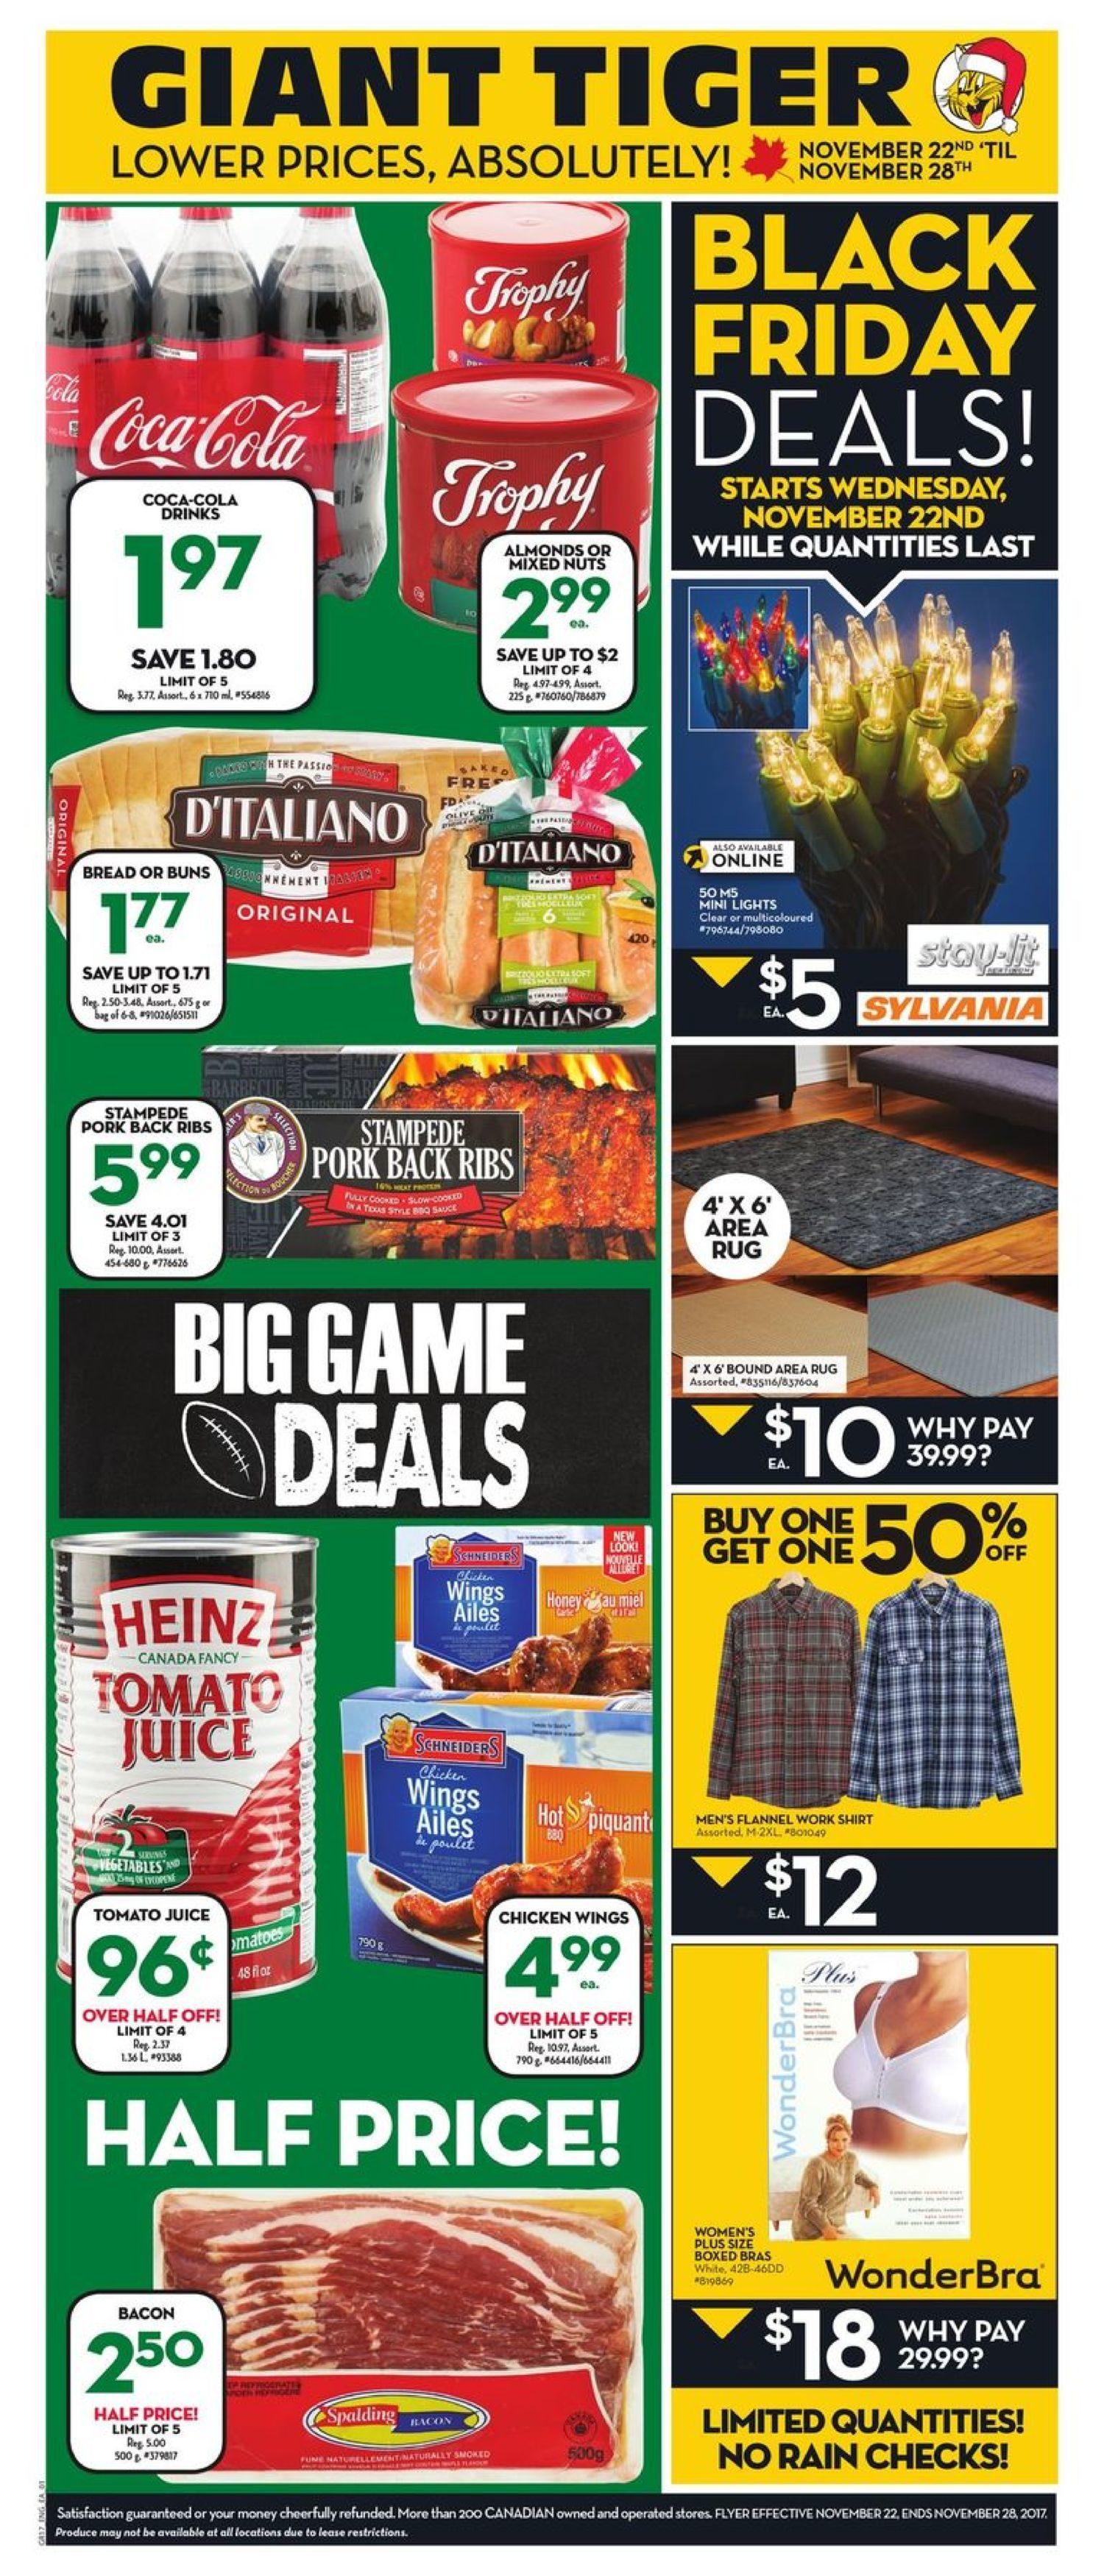 Giant Tiger Weekly Flyer Black Friday Deals Nov 22 28 Redflagdeals Com